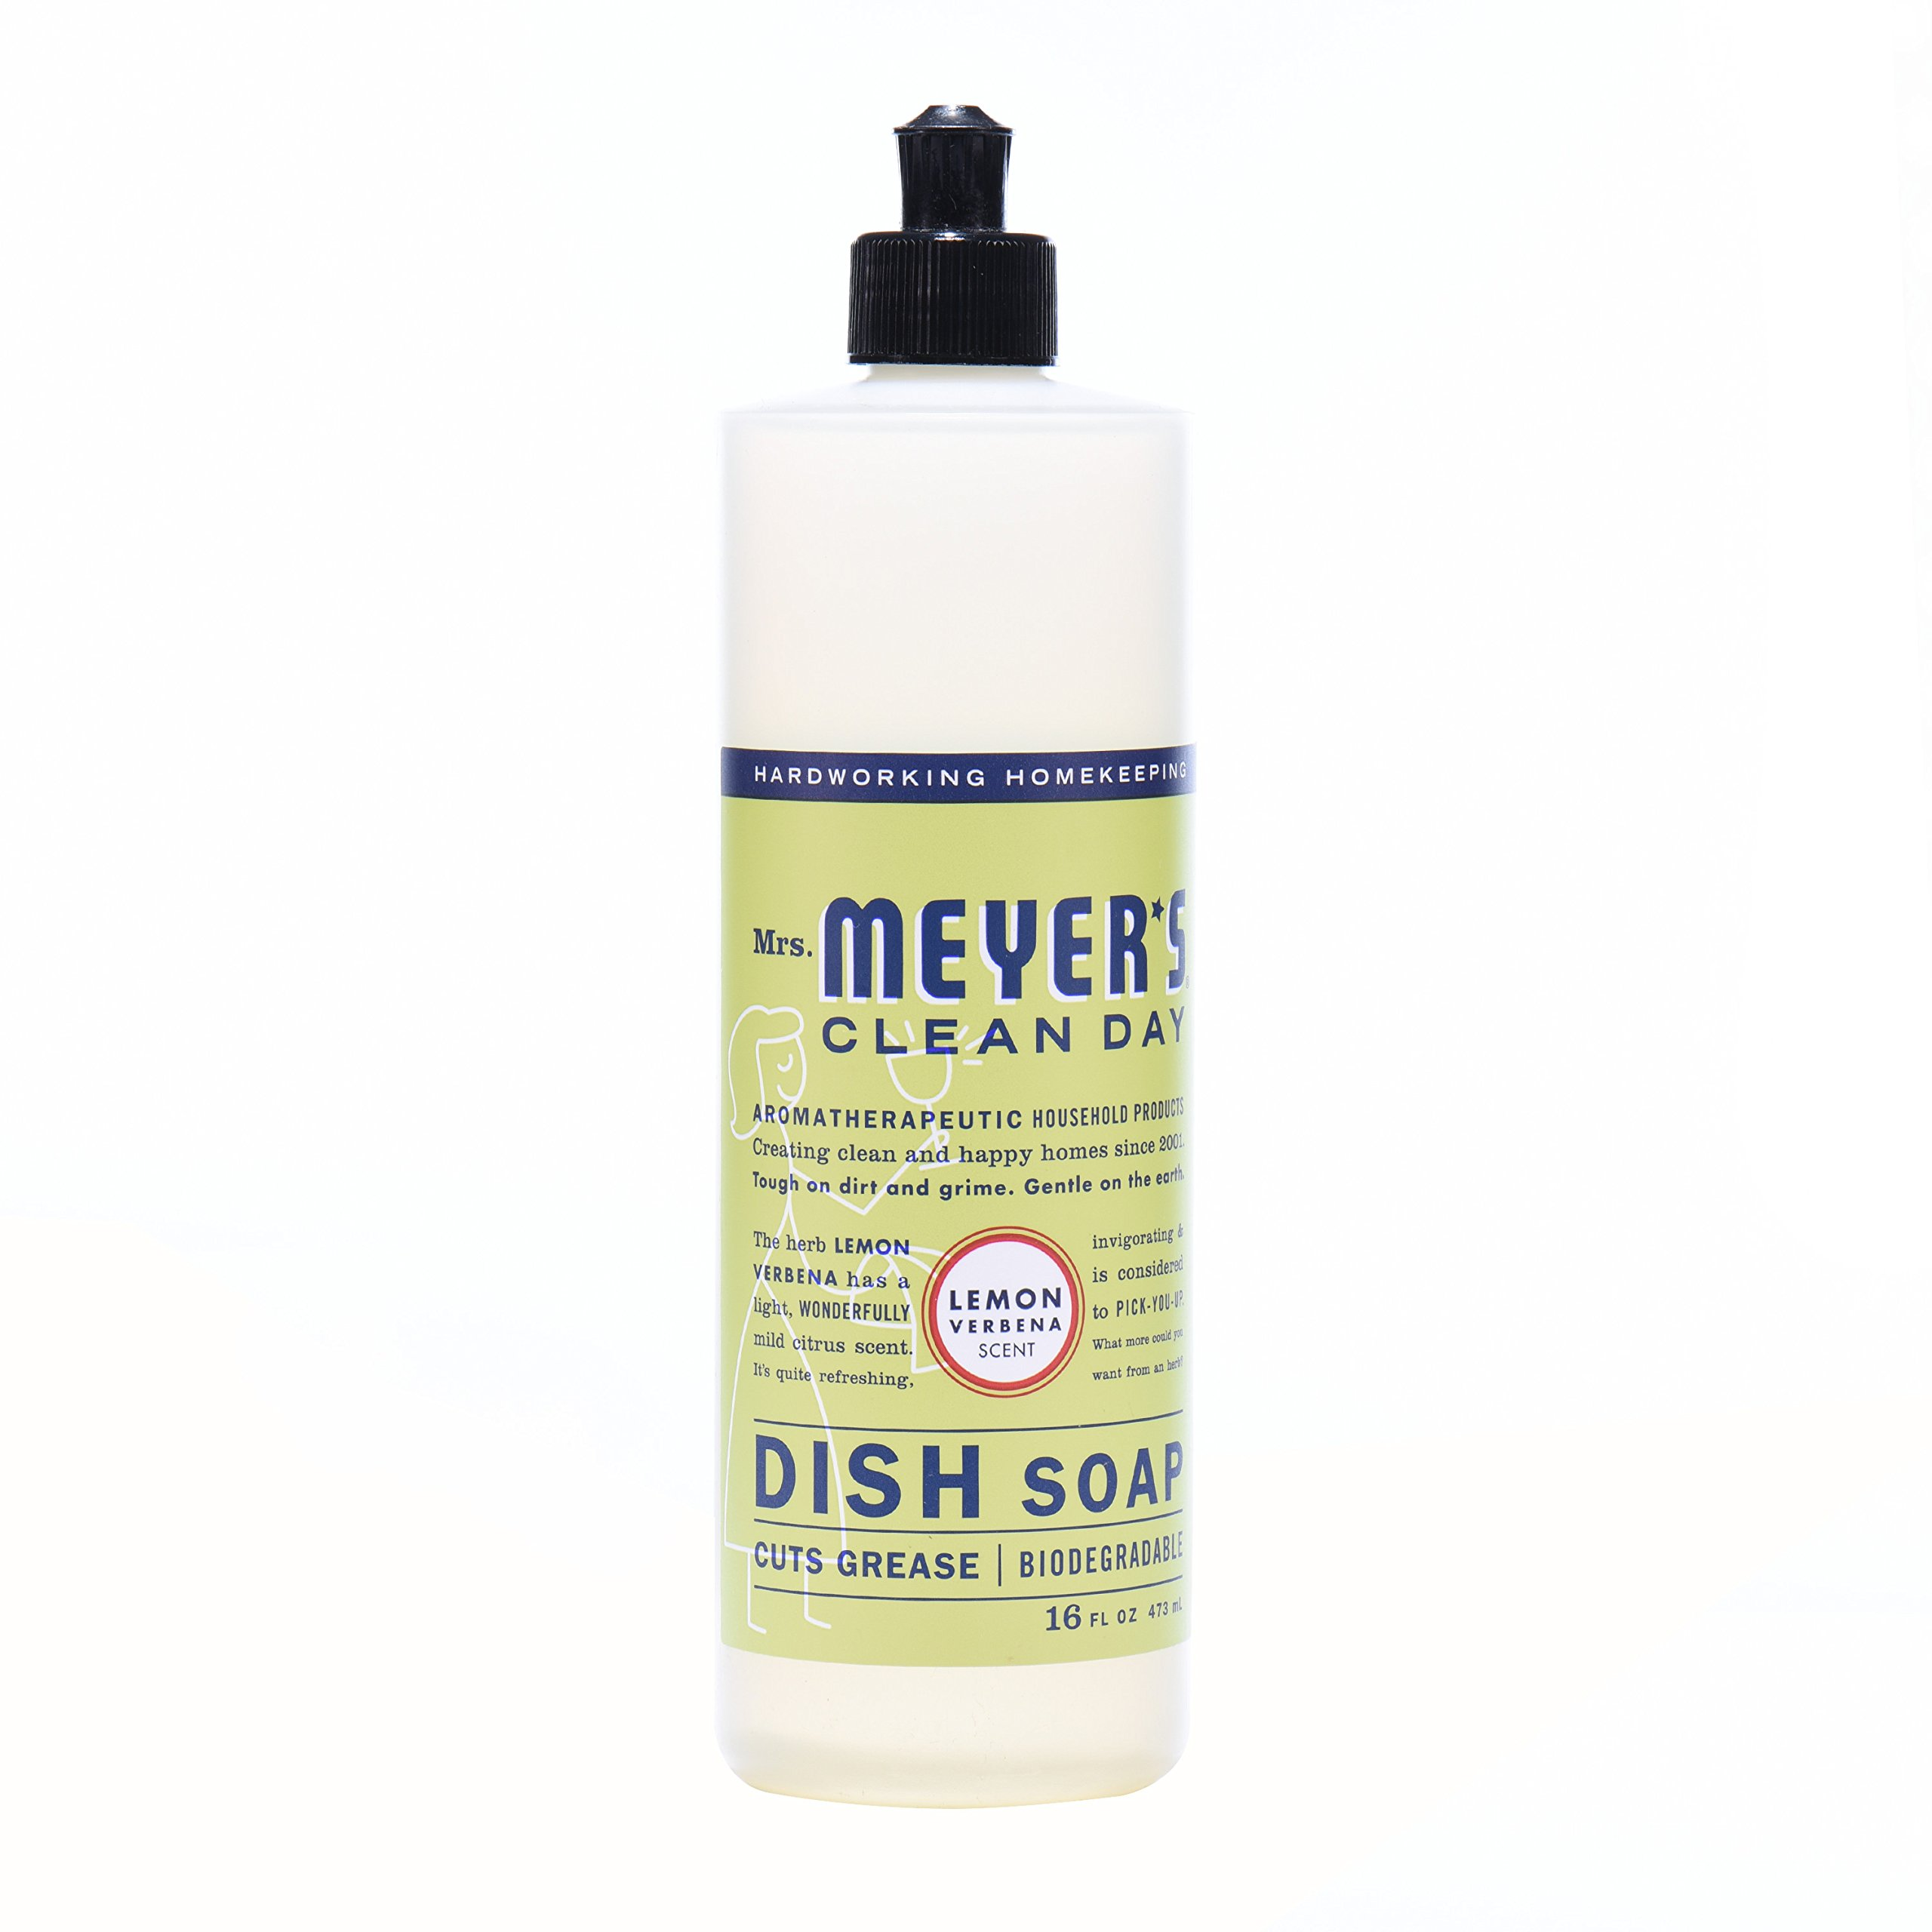 Mrs. Meyer's Clean Day Kitchen Basics Set, Lemon Verbena, 3 ct: Dish Soap (16 fl oz), Hand Soap (12.5 fl oz), Multi-Surface Everyday Cleaner (16 fl oz) by Mrs. Meyer's Clean Day (Image #3)